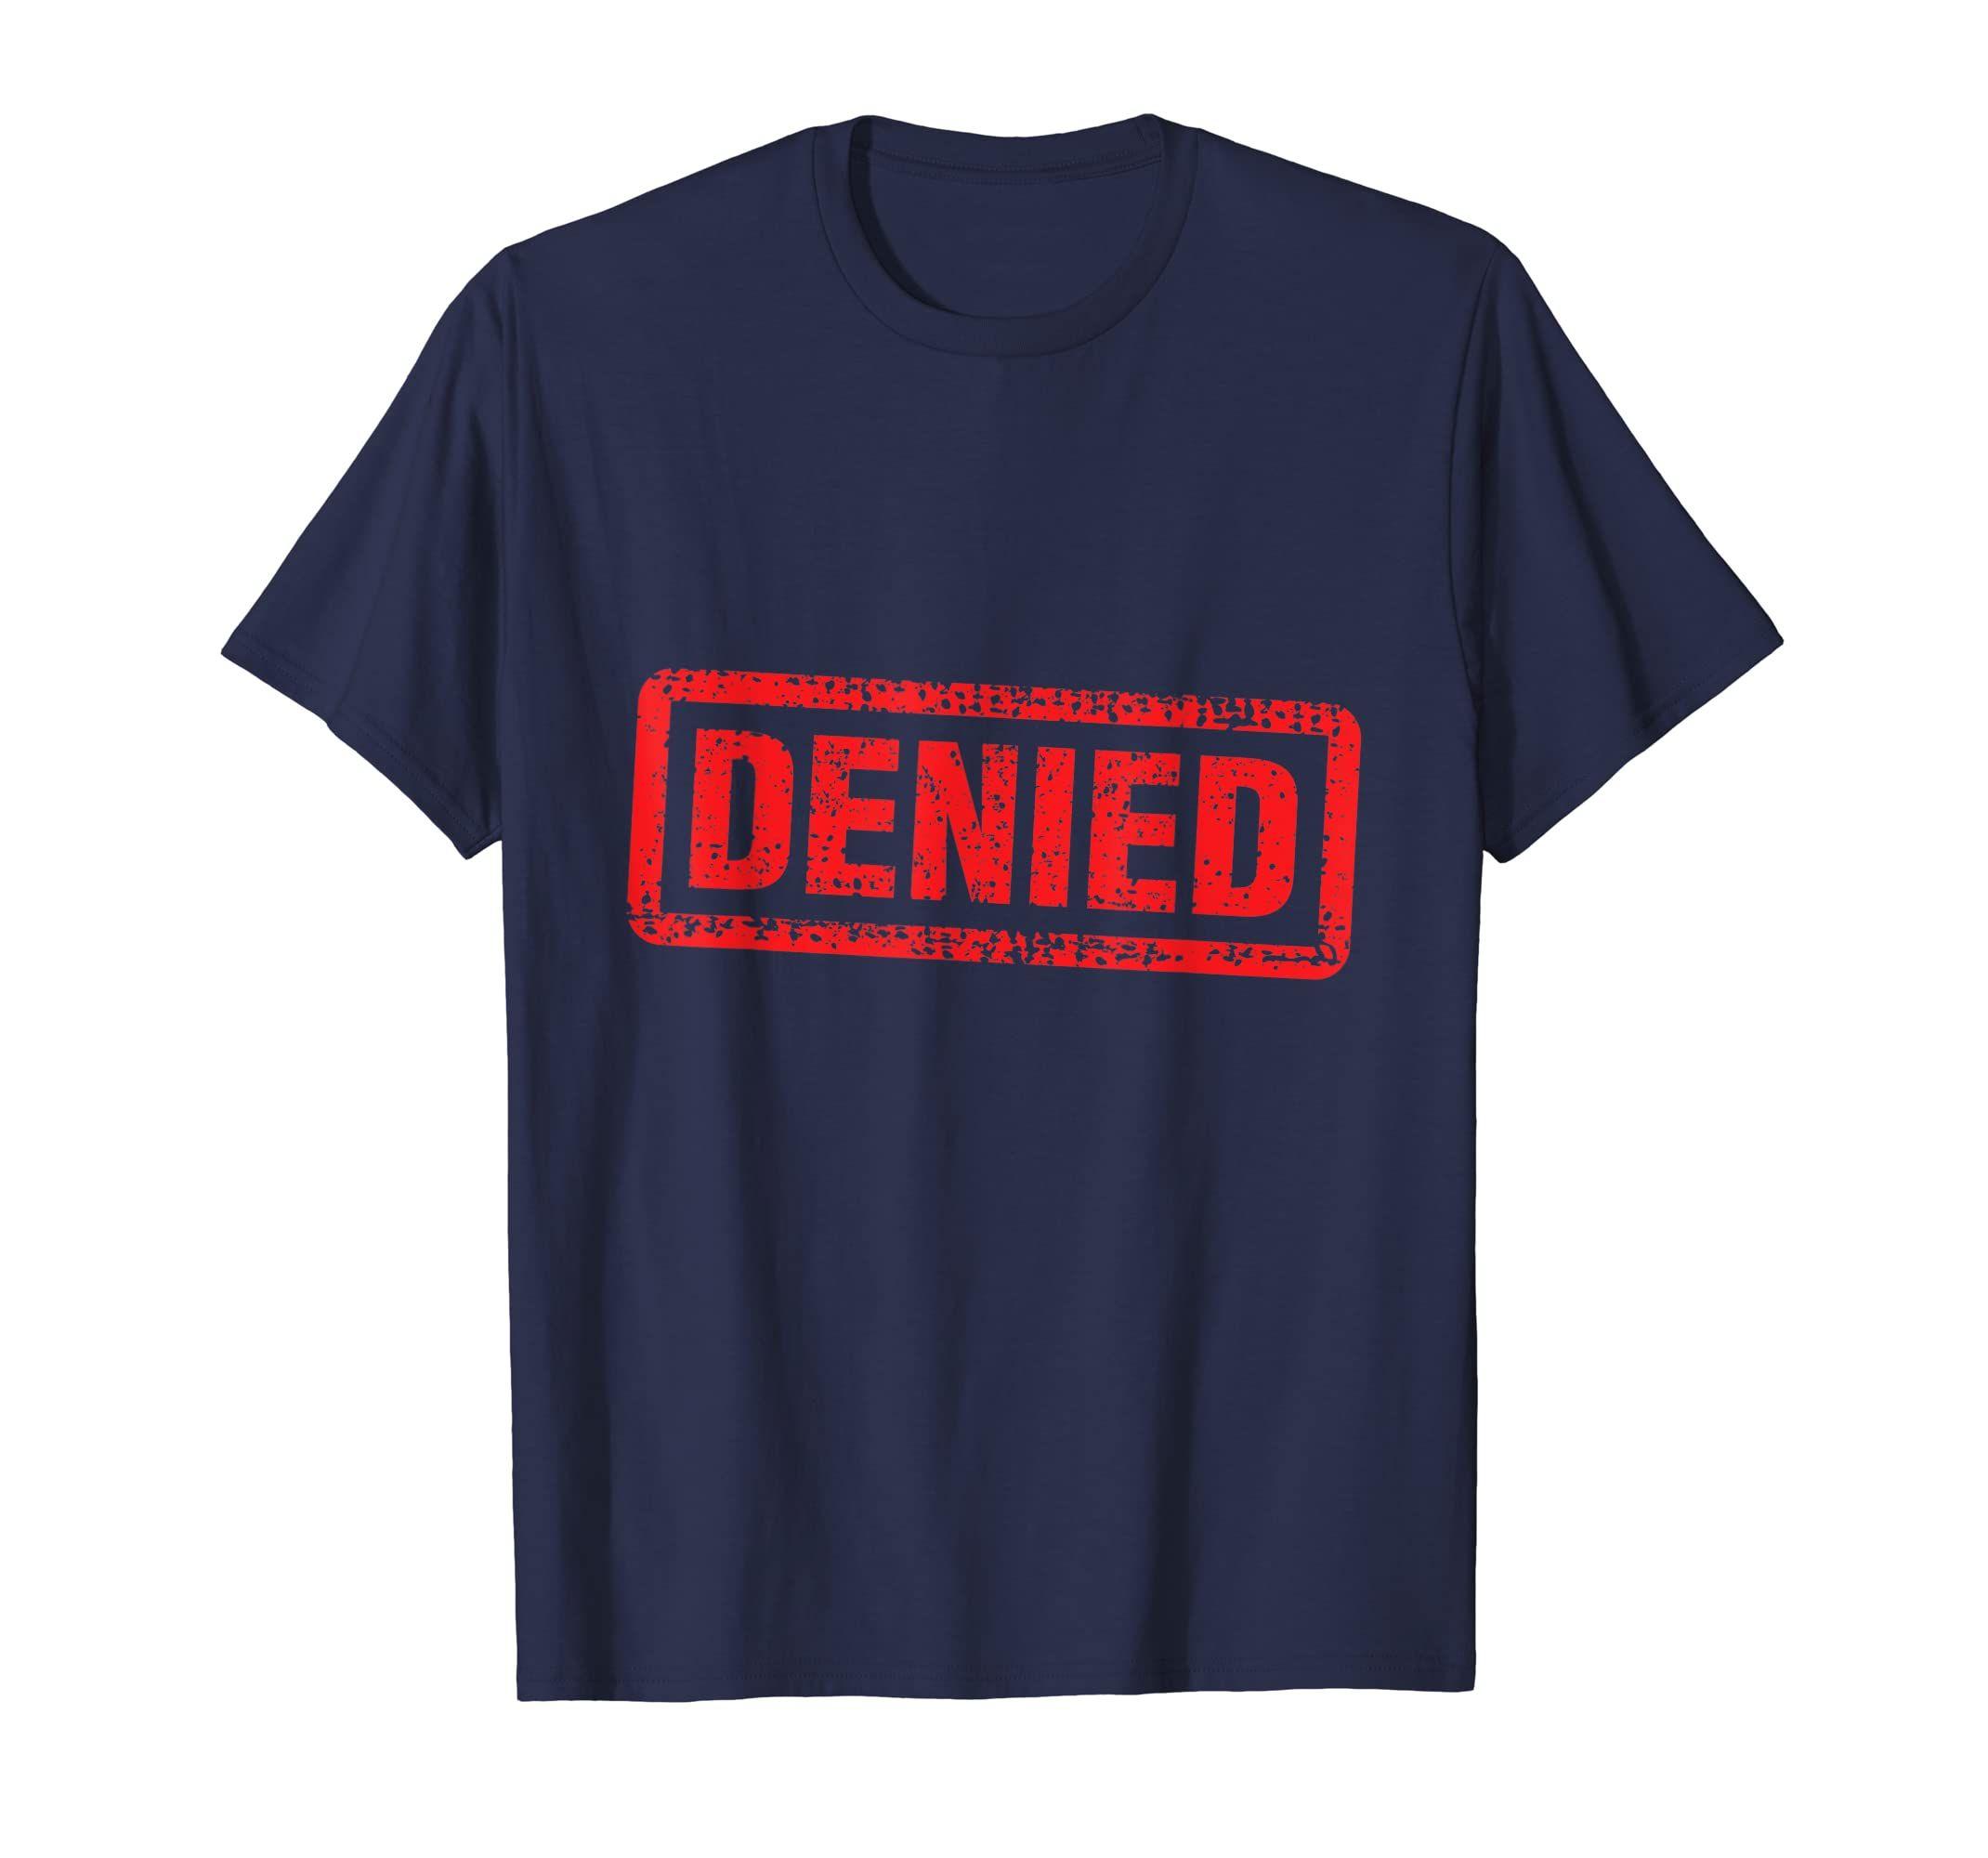 Denied Grunge Distressed Stamp T-Shirt-Teehay